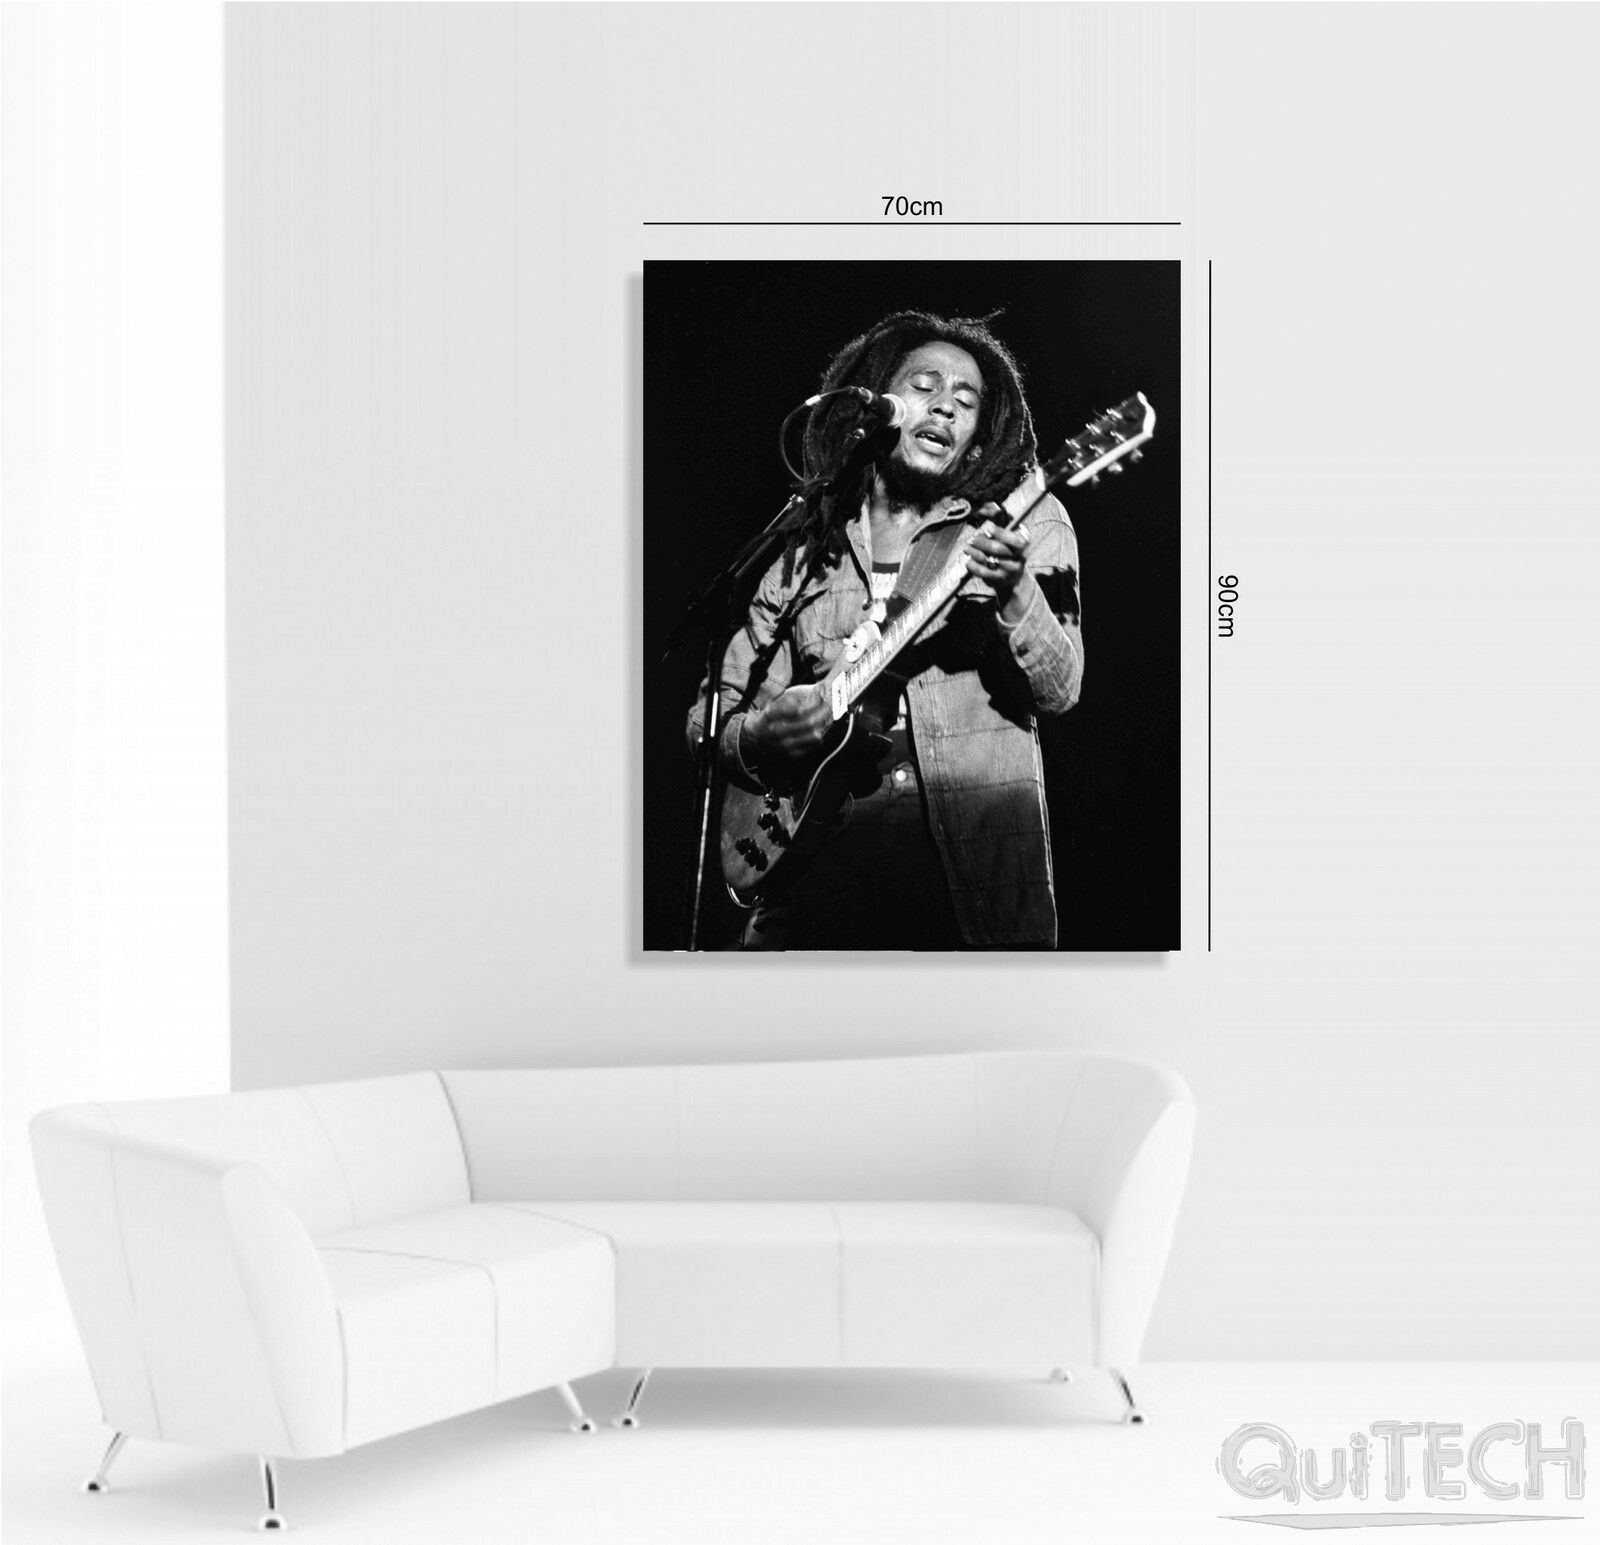 Bob stampa Marley - 7 - Quadro stampa Bob su Tela Pelle Canvas Dipinto Arte Moderna ce5527